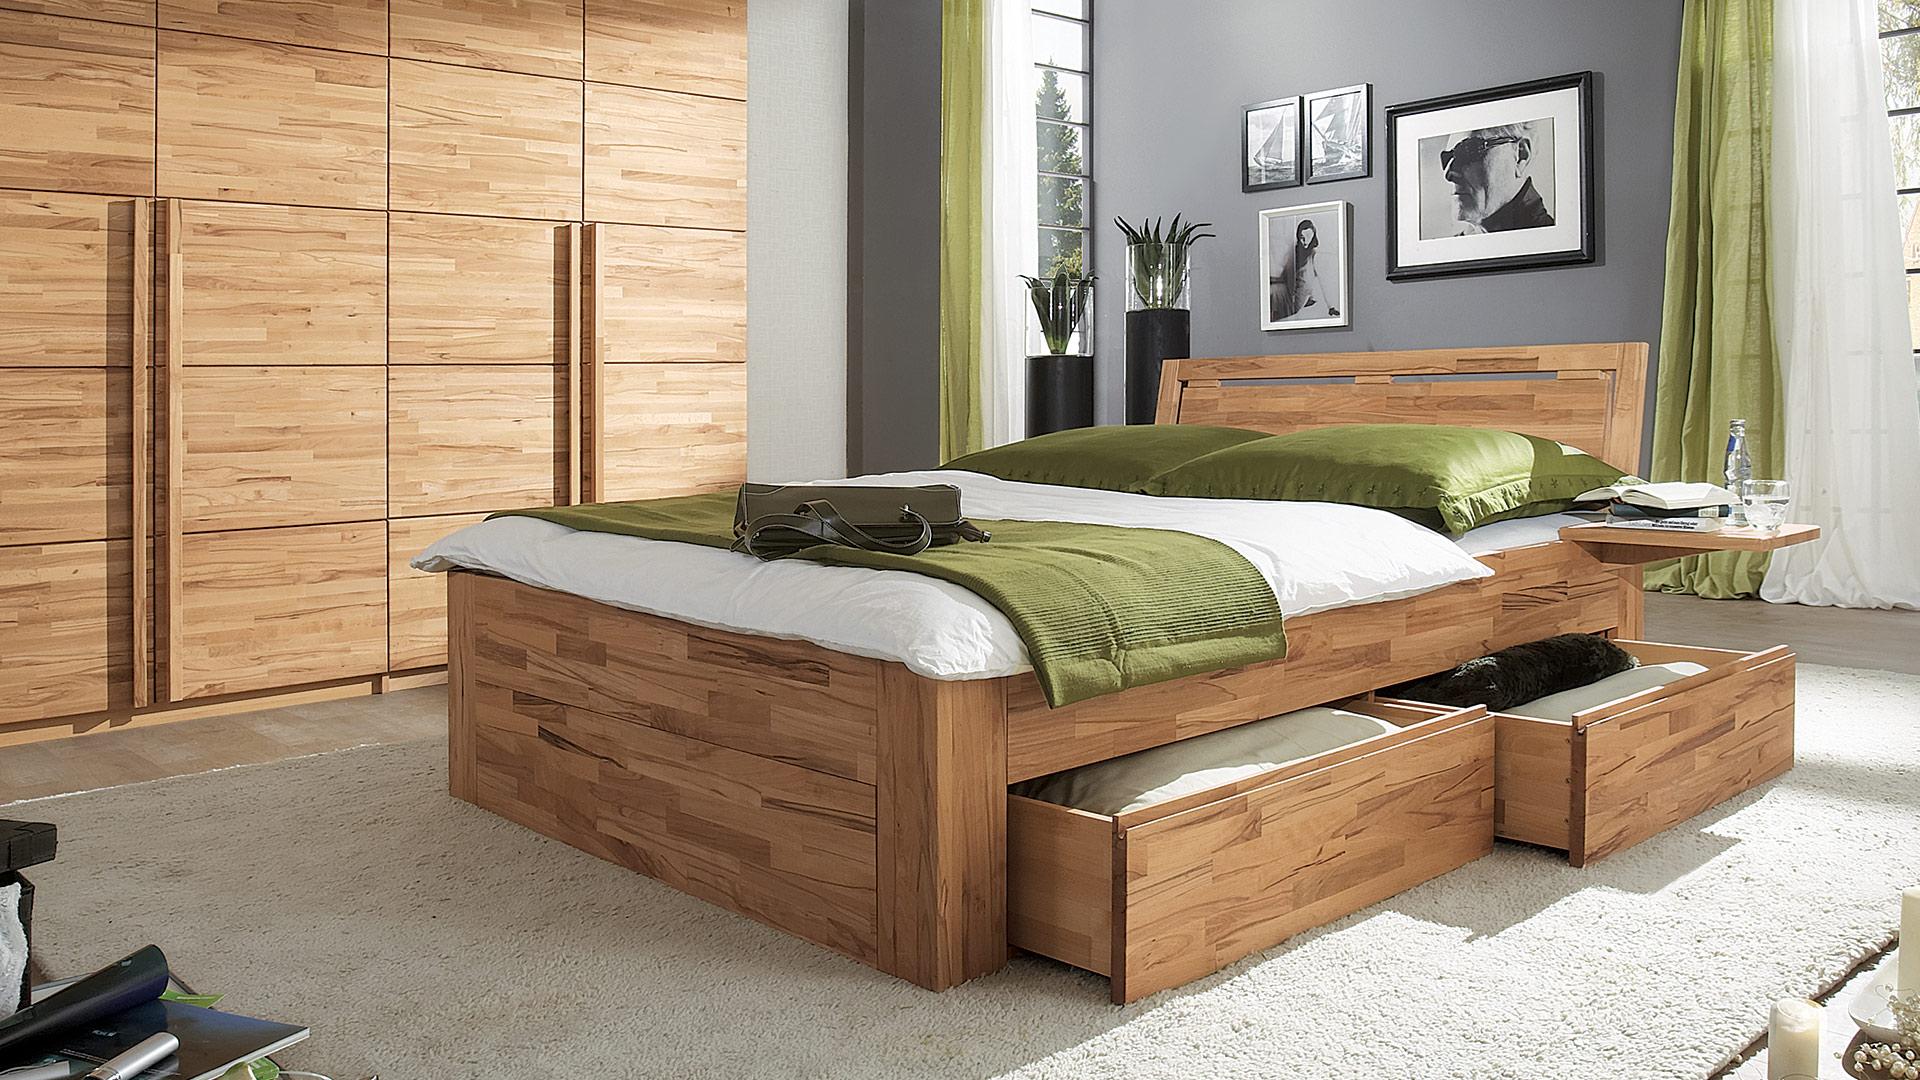 schubkastenbett letizia. Black Bedroom Furniture Sets. Home Design Ideas